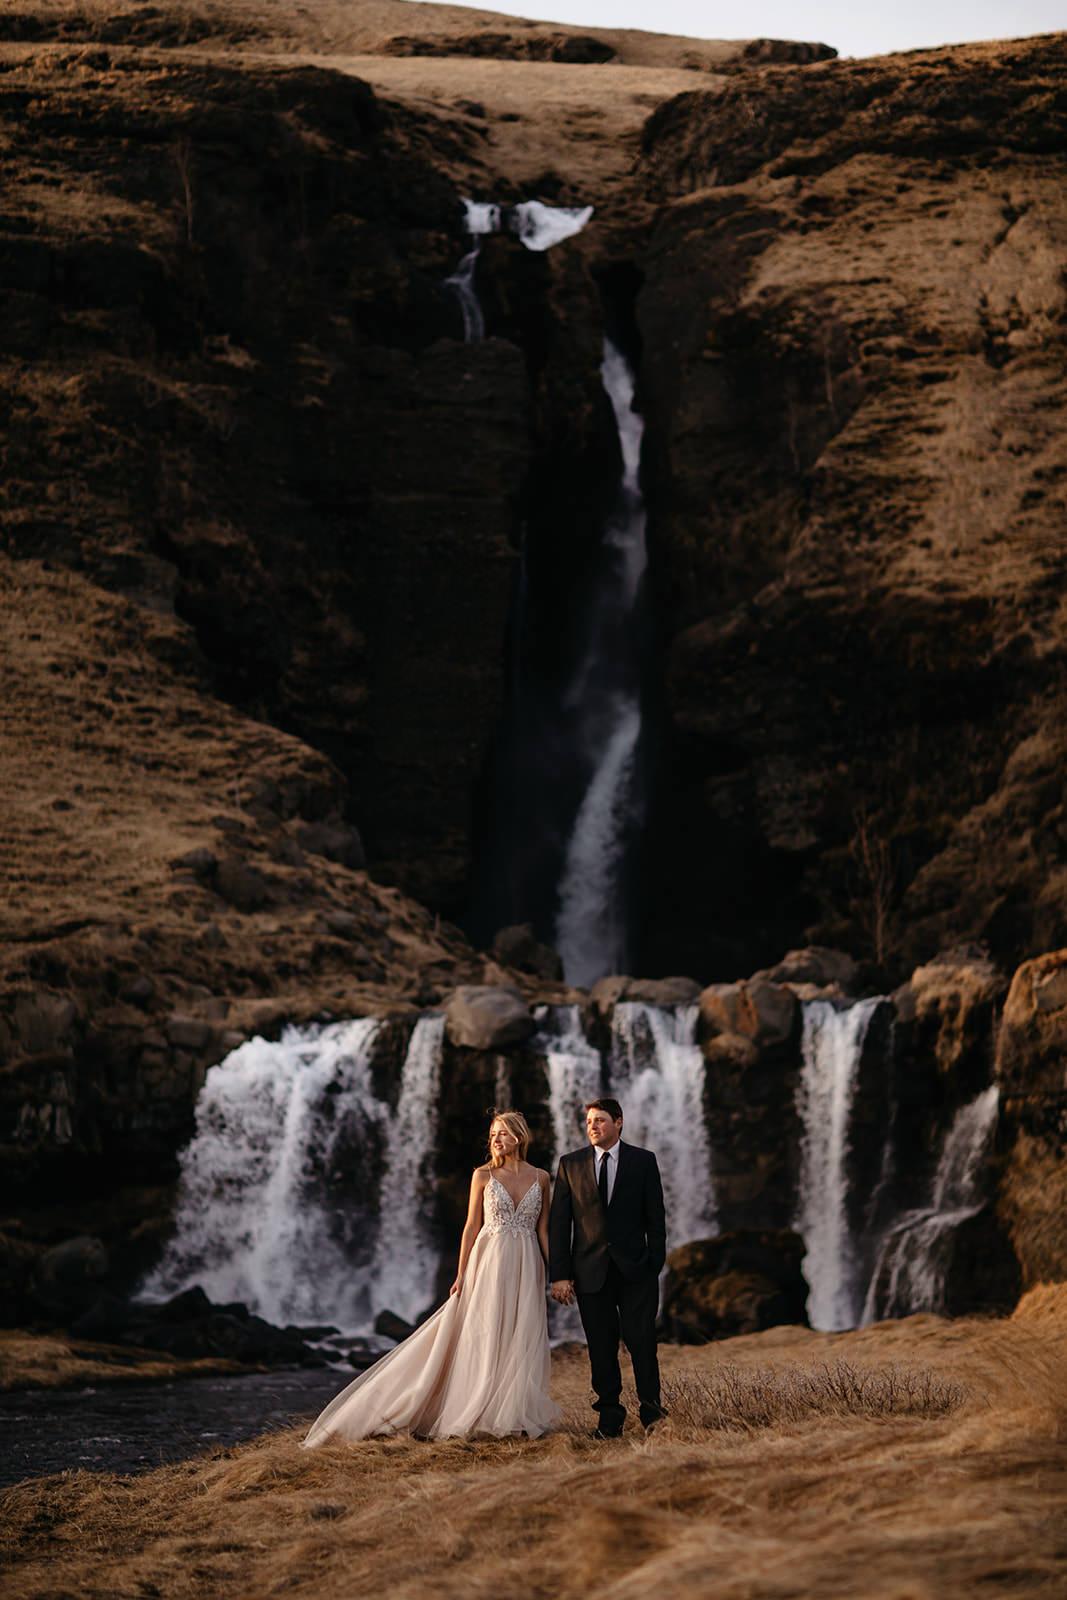 Icelandic Iceland Elopement Wedding Elope Photographer Eloping Reykjavík Vik Black Sand Beach Jökulsárlón Skogafoss Waterfall Vestrahorn Mountain Liz Osban Photography Destination 115.jpg